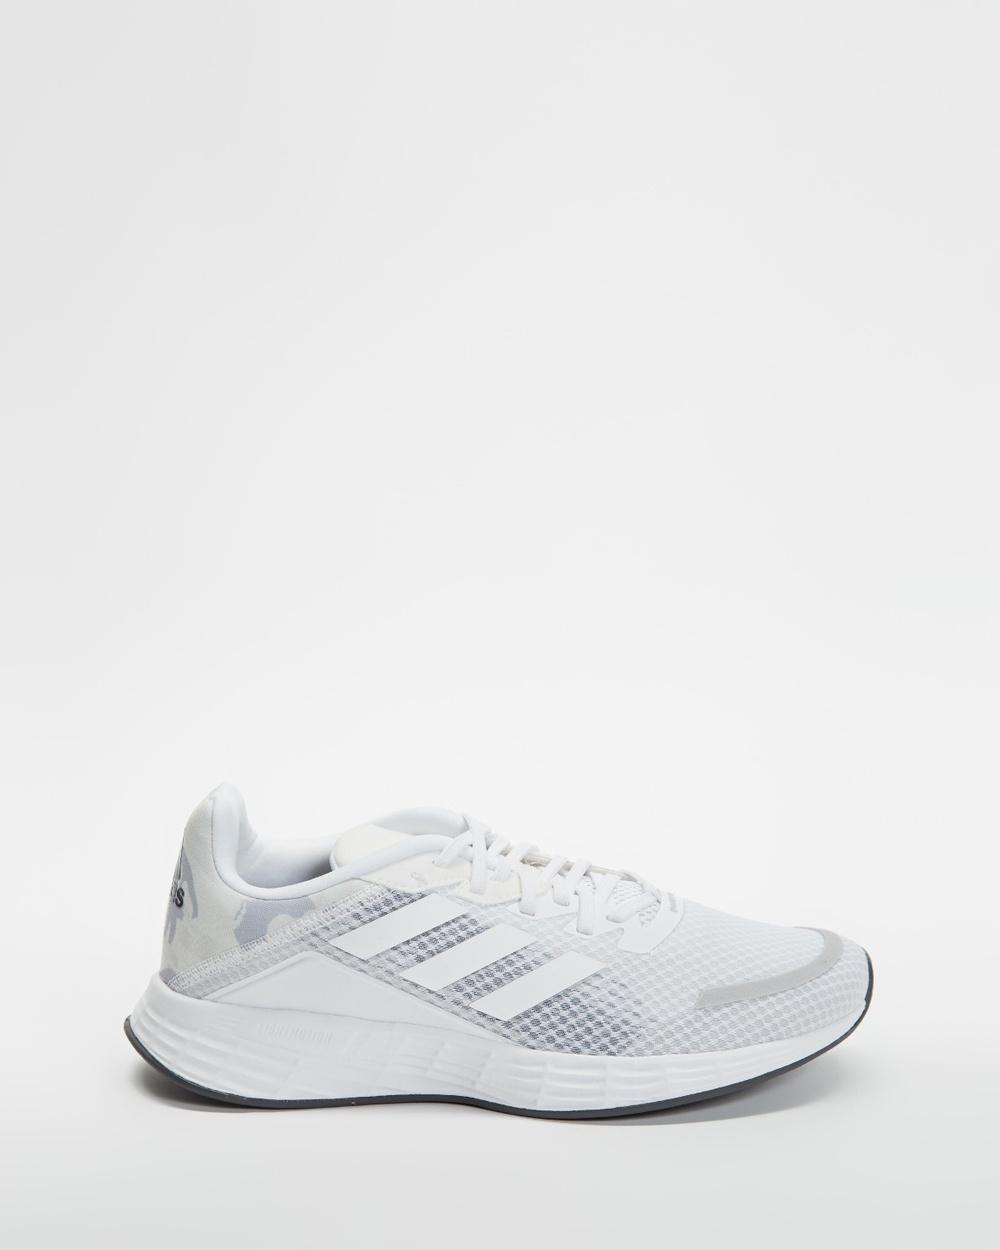 adidas Performance Duramo Sneakers Shoes White & Dash Grey